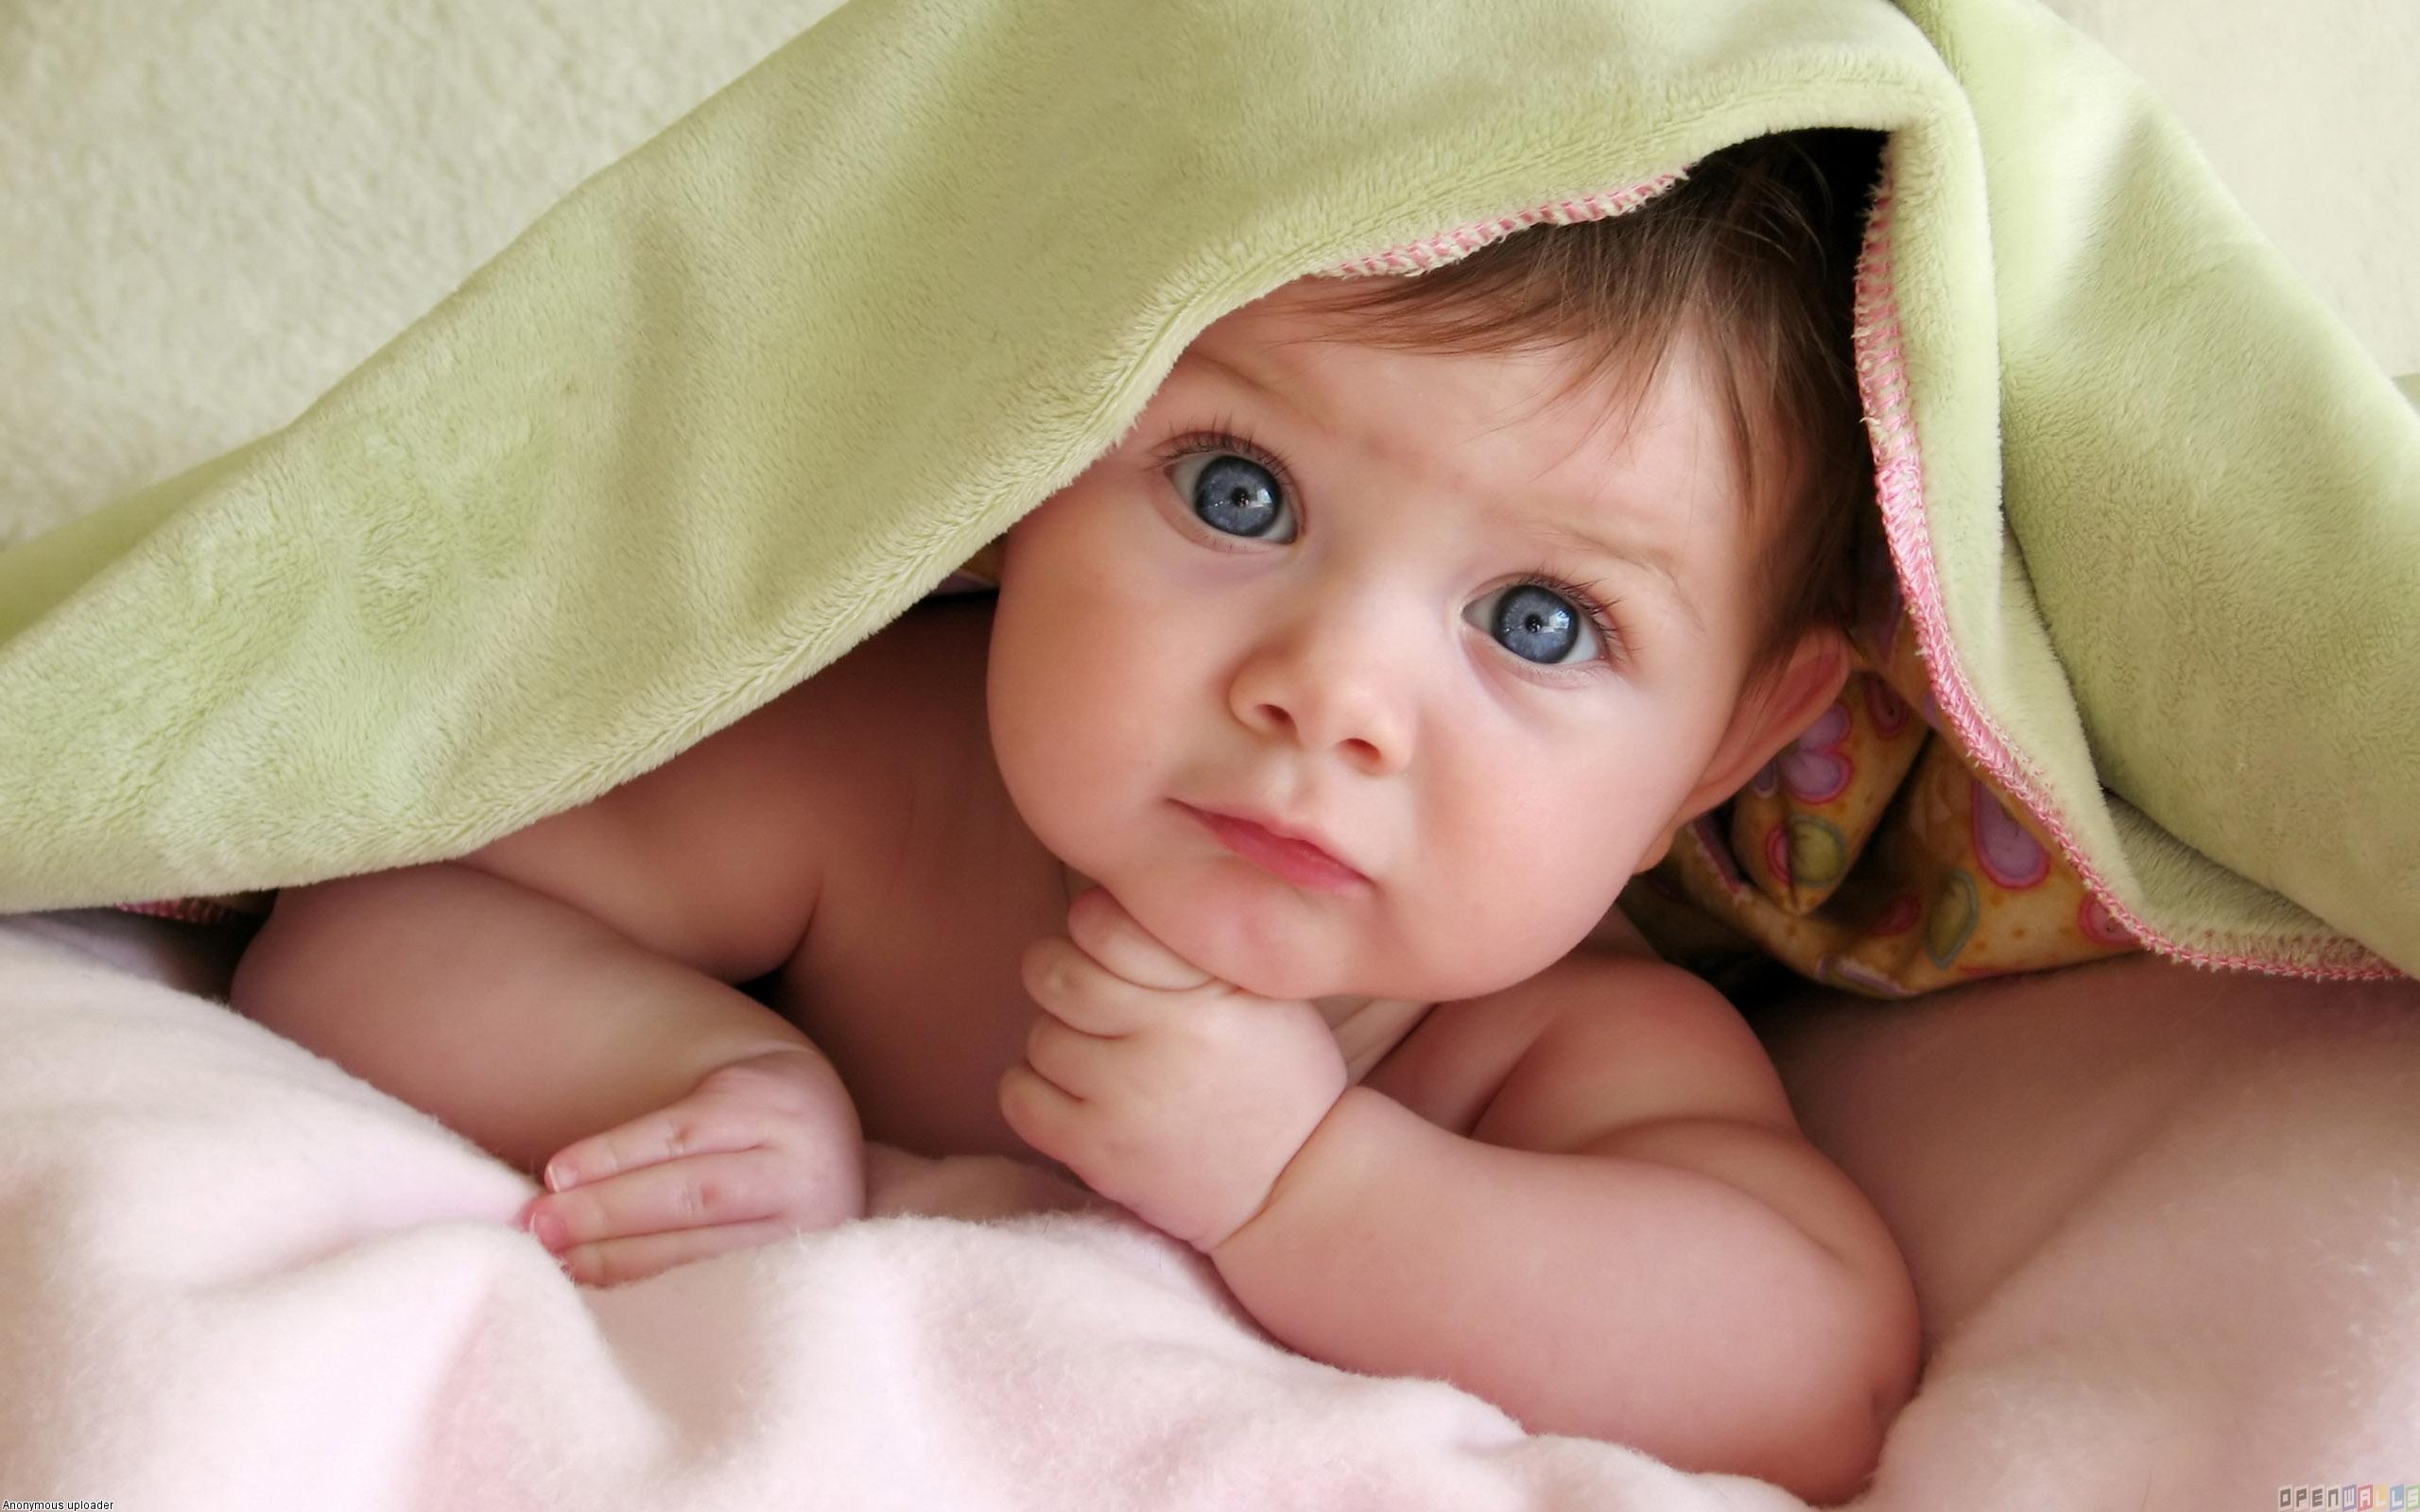 Adorable Baby Wallpaper